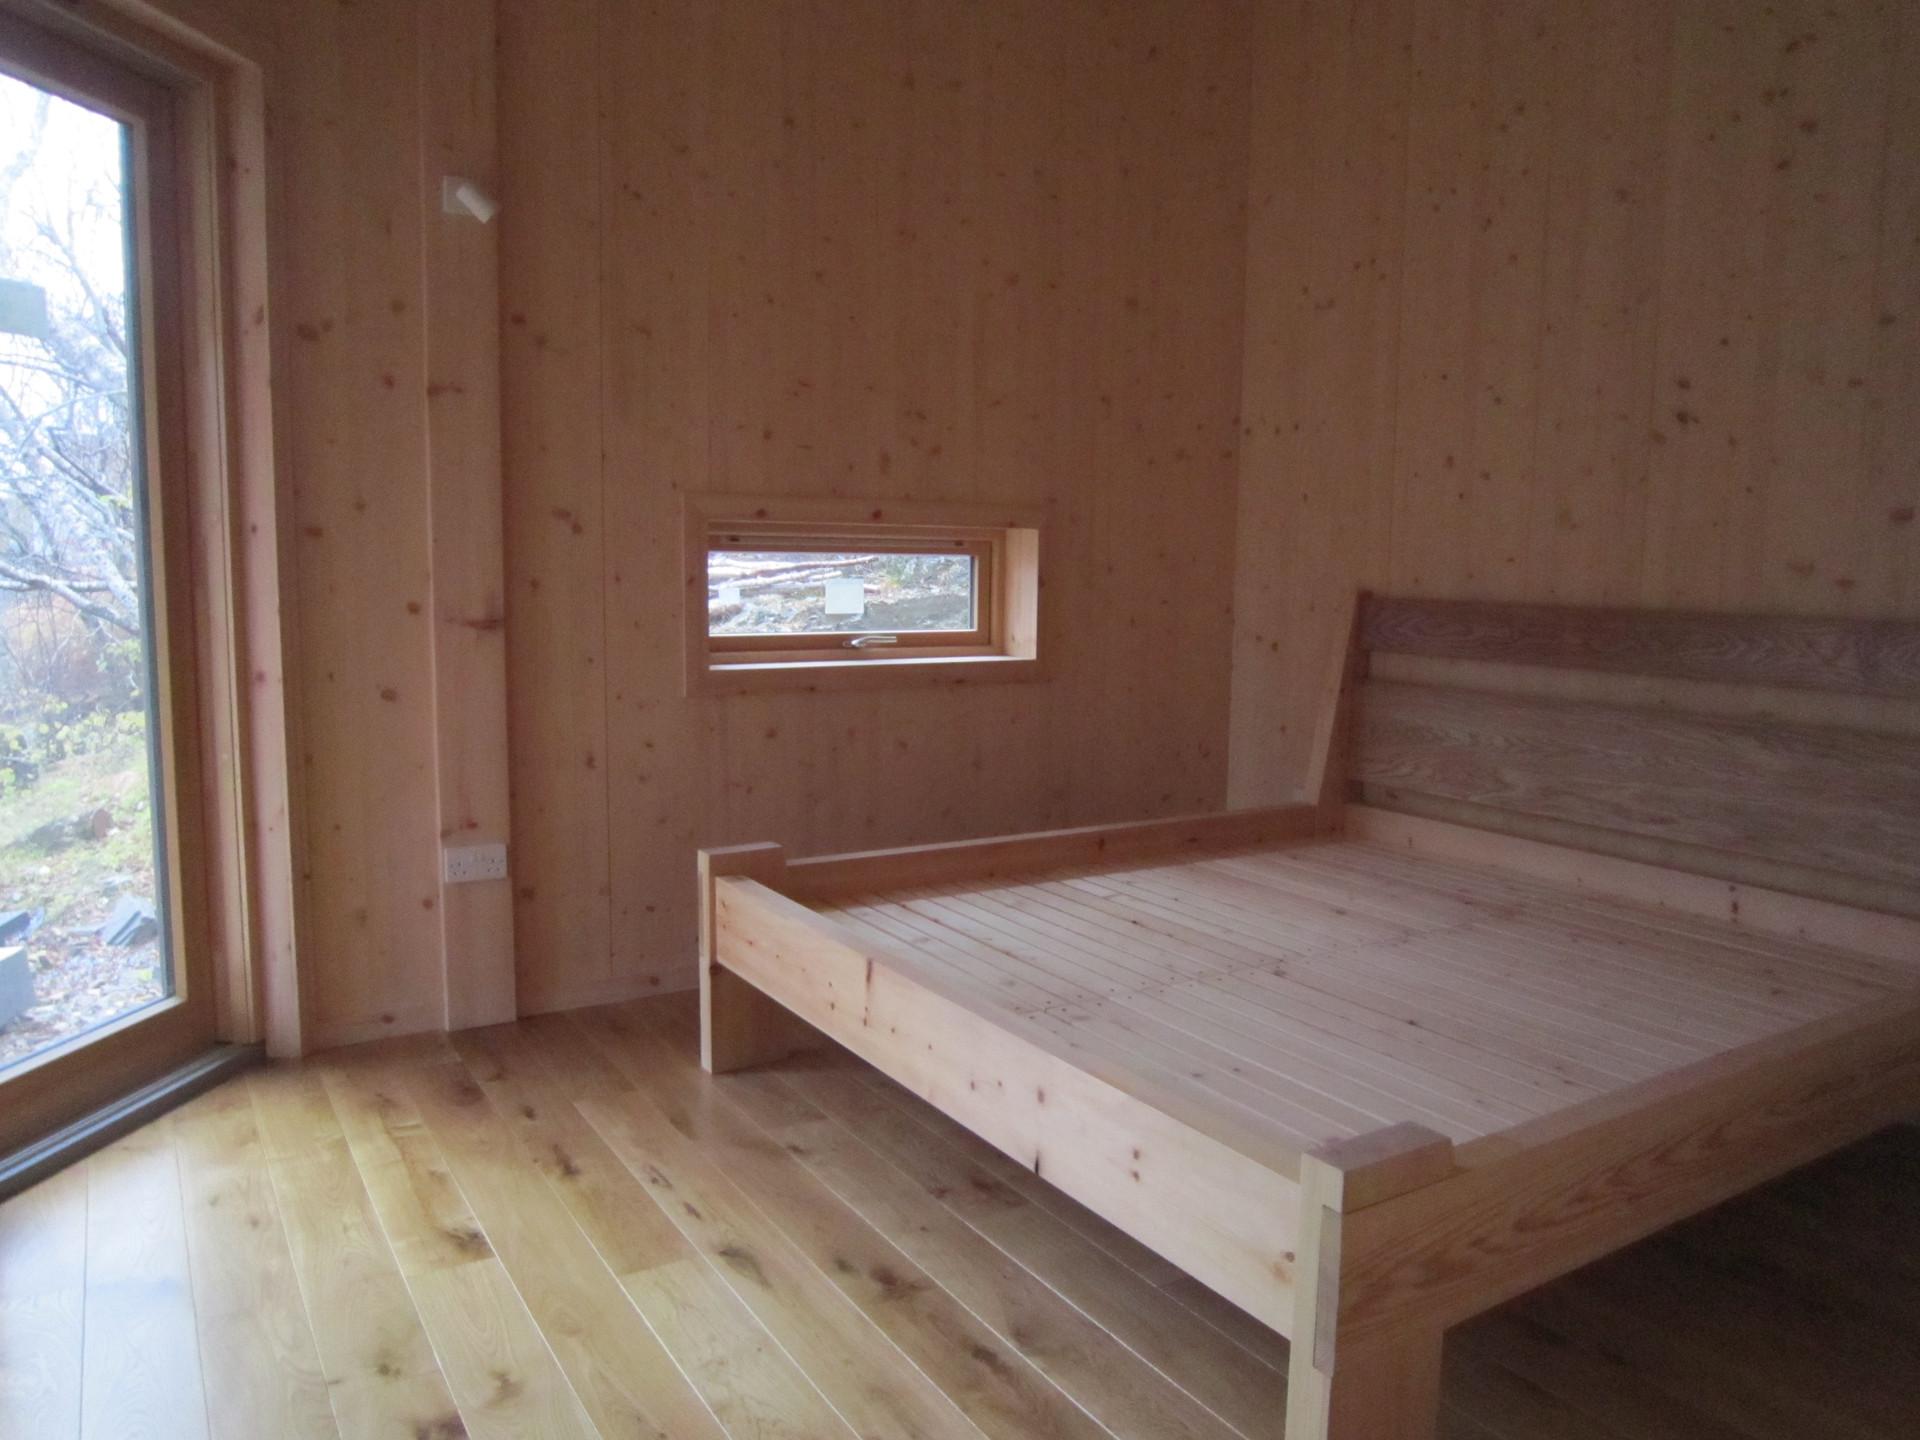 Native hardwood furniture